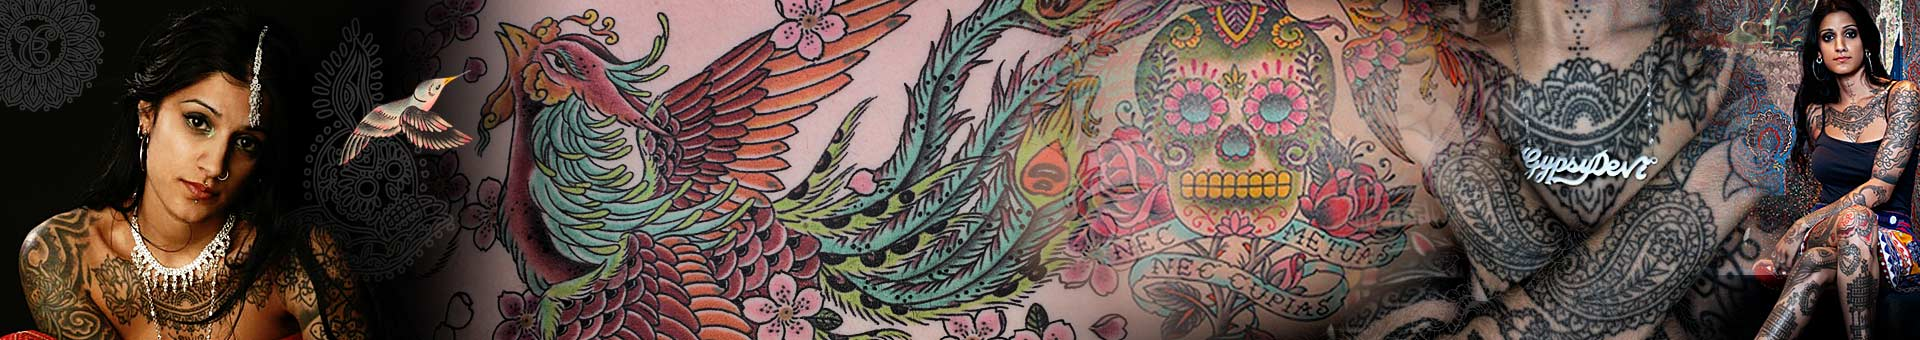 Saira Hunjan - Tattoo Artist and Fashion Designer based in London